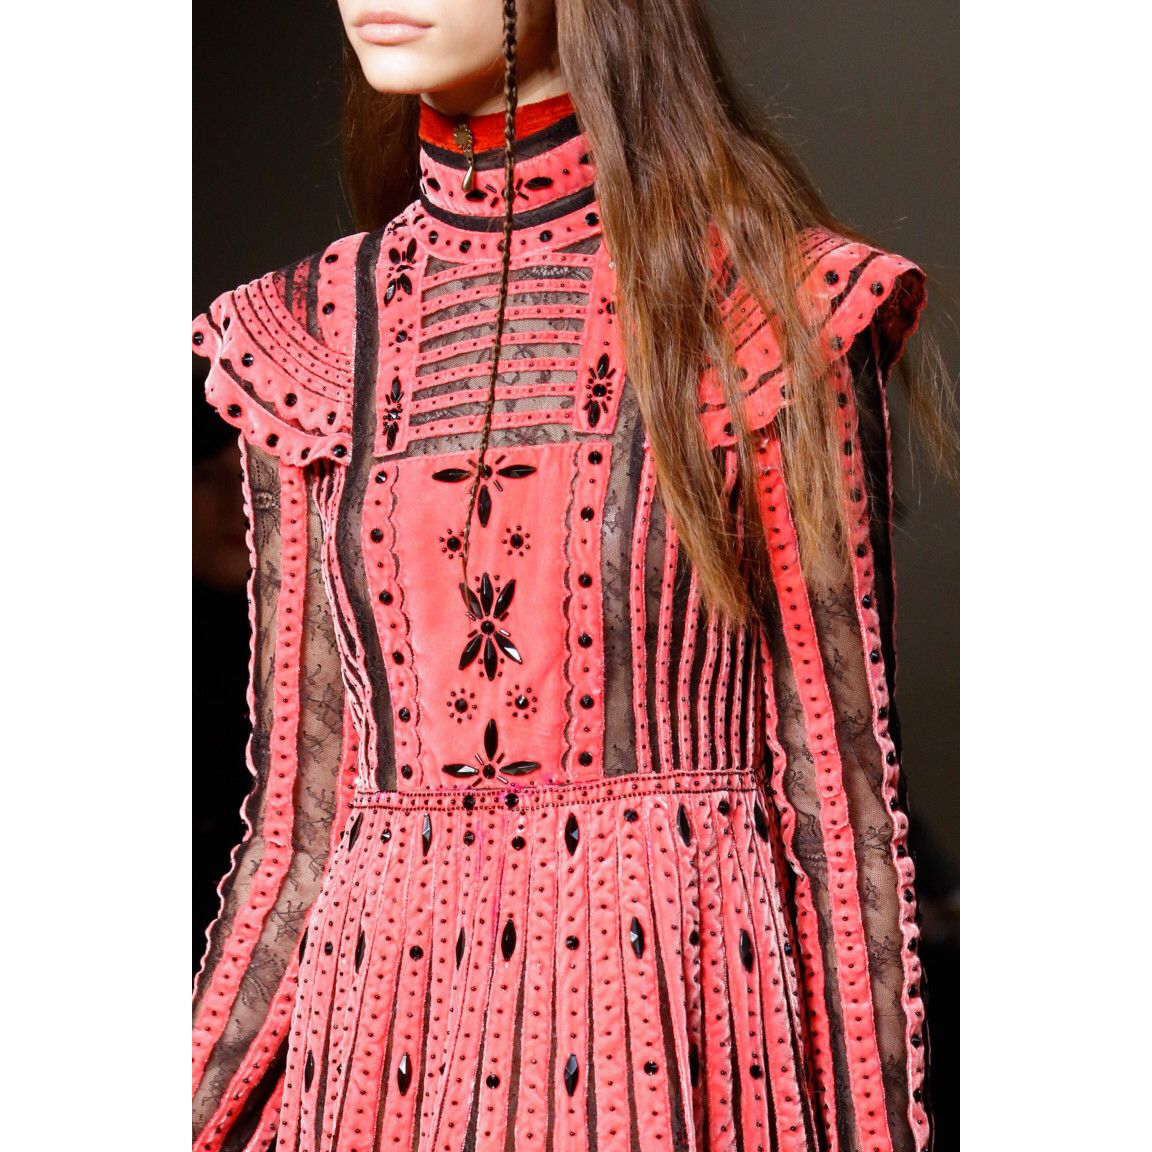 Valentino  #VogueRussia #readytowear #rtw #fallwinter2017 #Valentino #VogueCollections